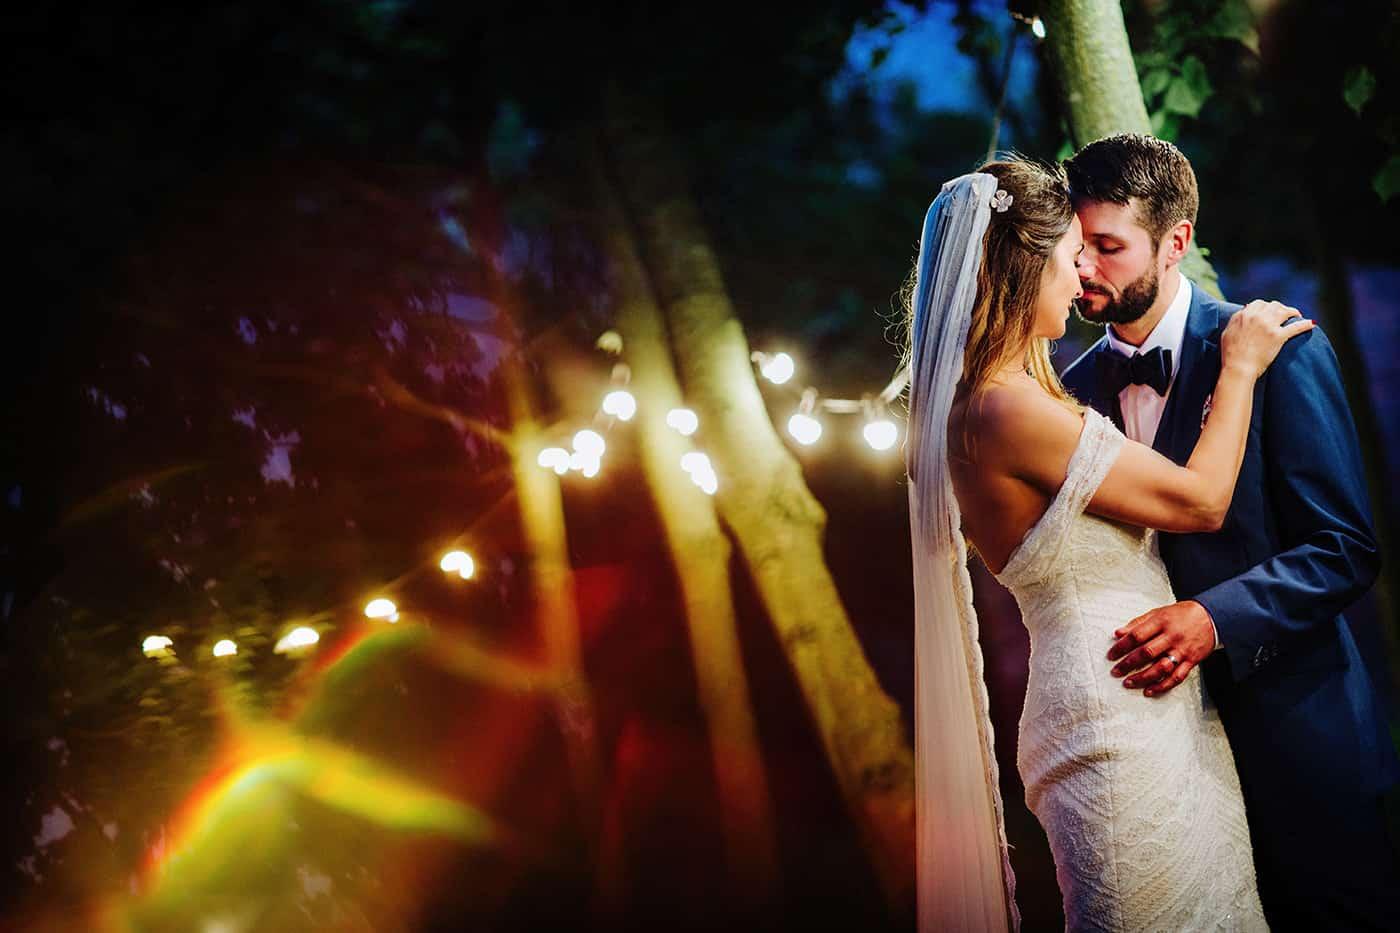 Bride & groom at Shustoke Farm Barns